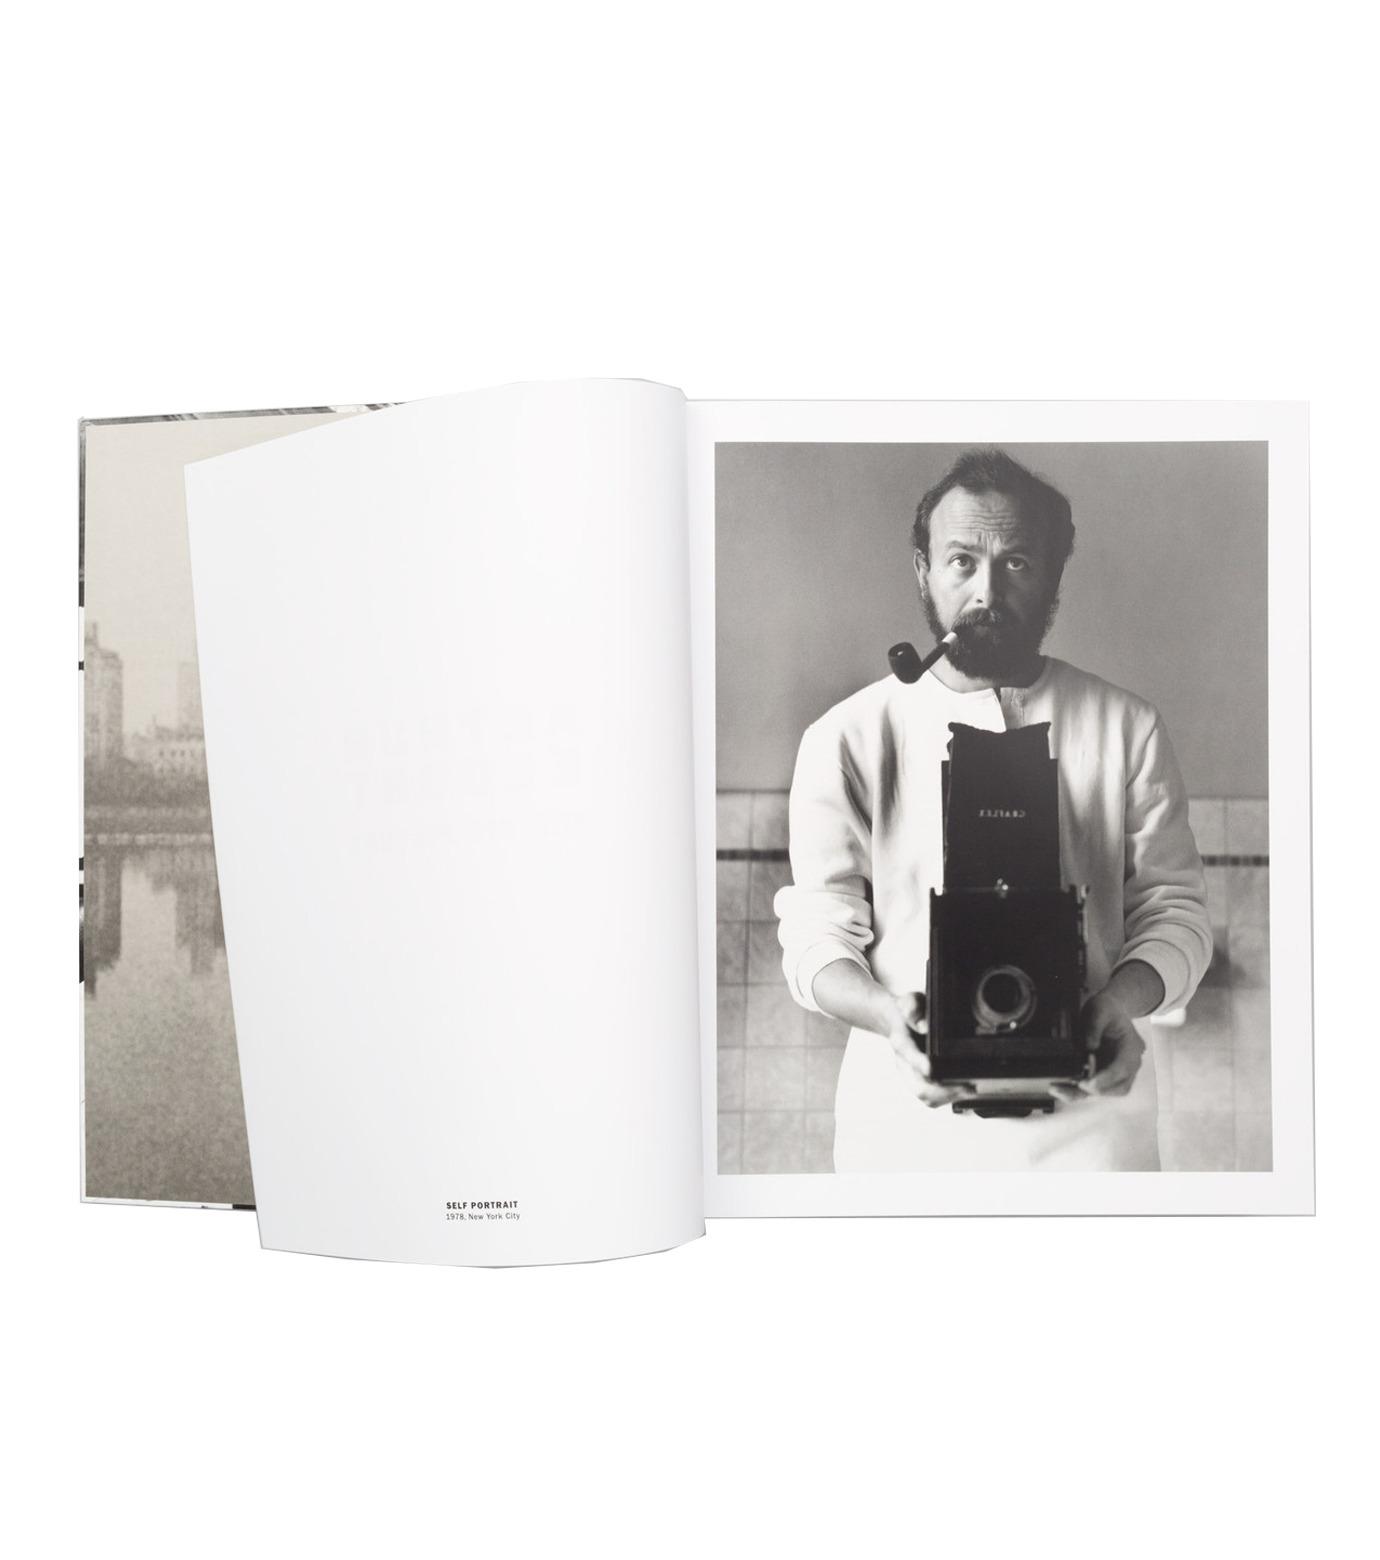 ArtBook(アートブック)のArthur Elgort:The Big Picture.-GRAY(インテリア/OTHER-GOODS/interior/OTHER-GOODS)-86930-543-1-11 拡大詳細画像2